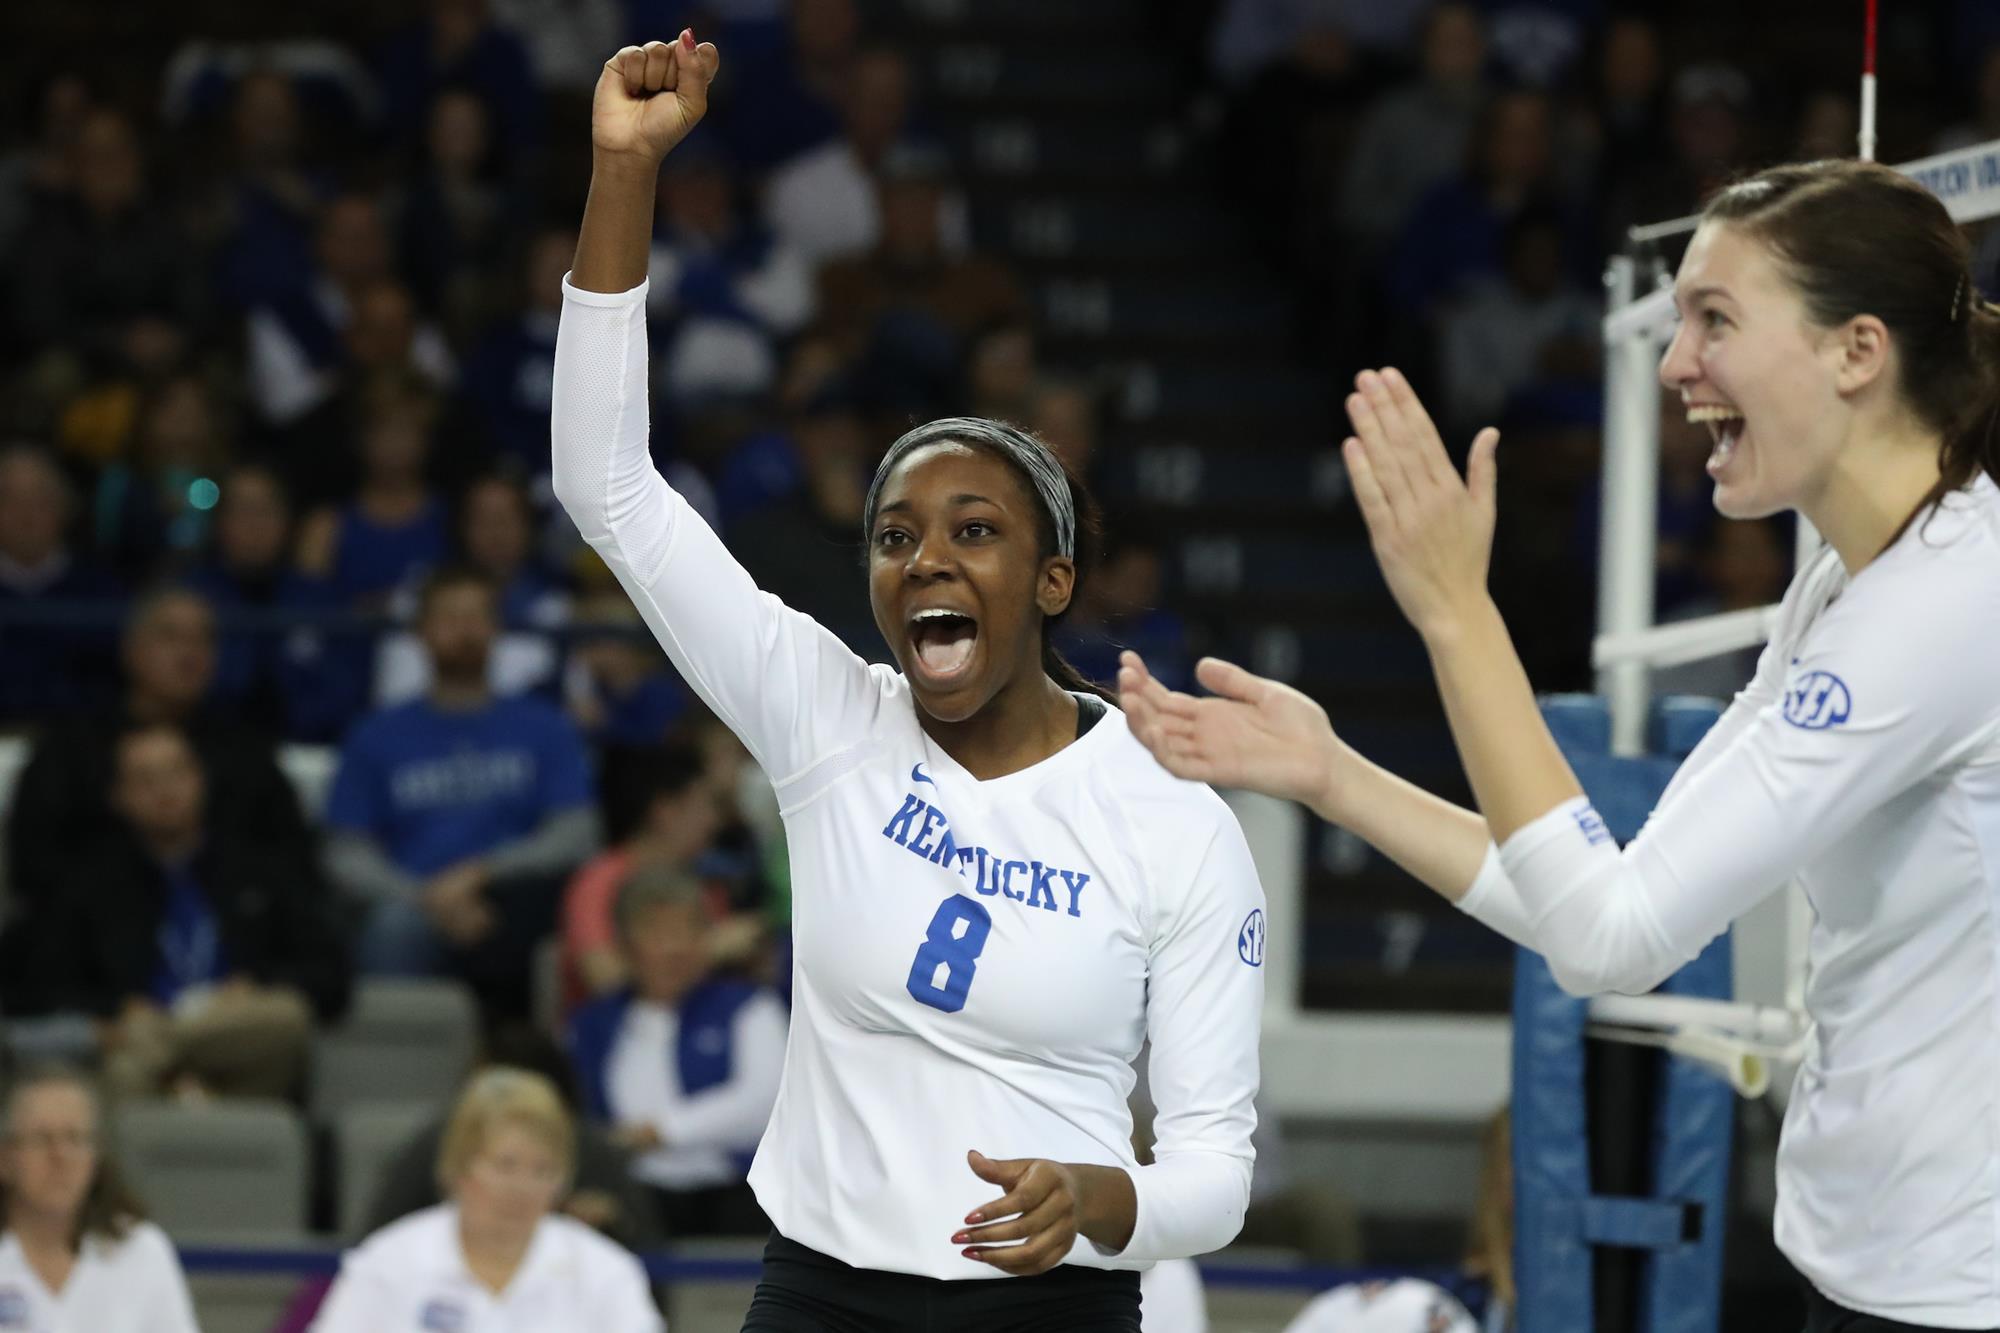 Darian Mack Volleyball University Of Kentucky Athletics